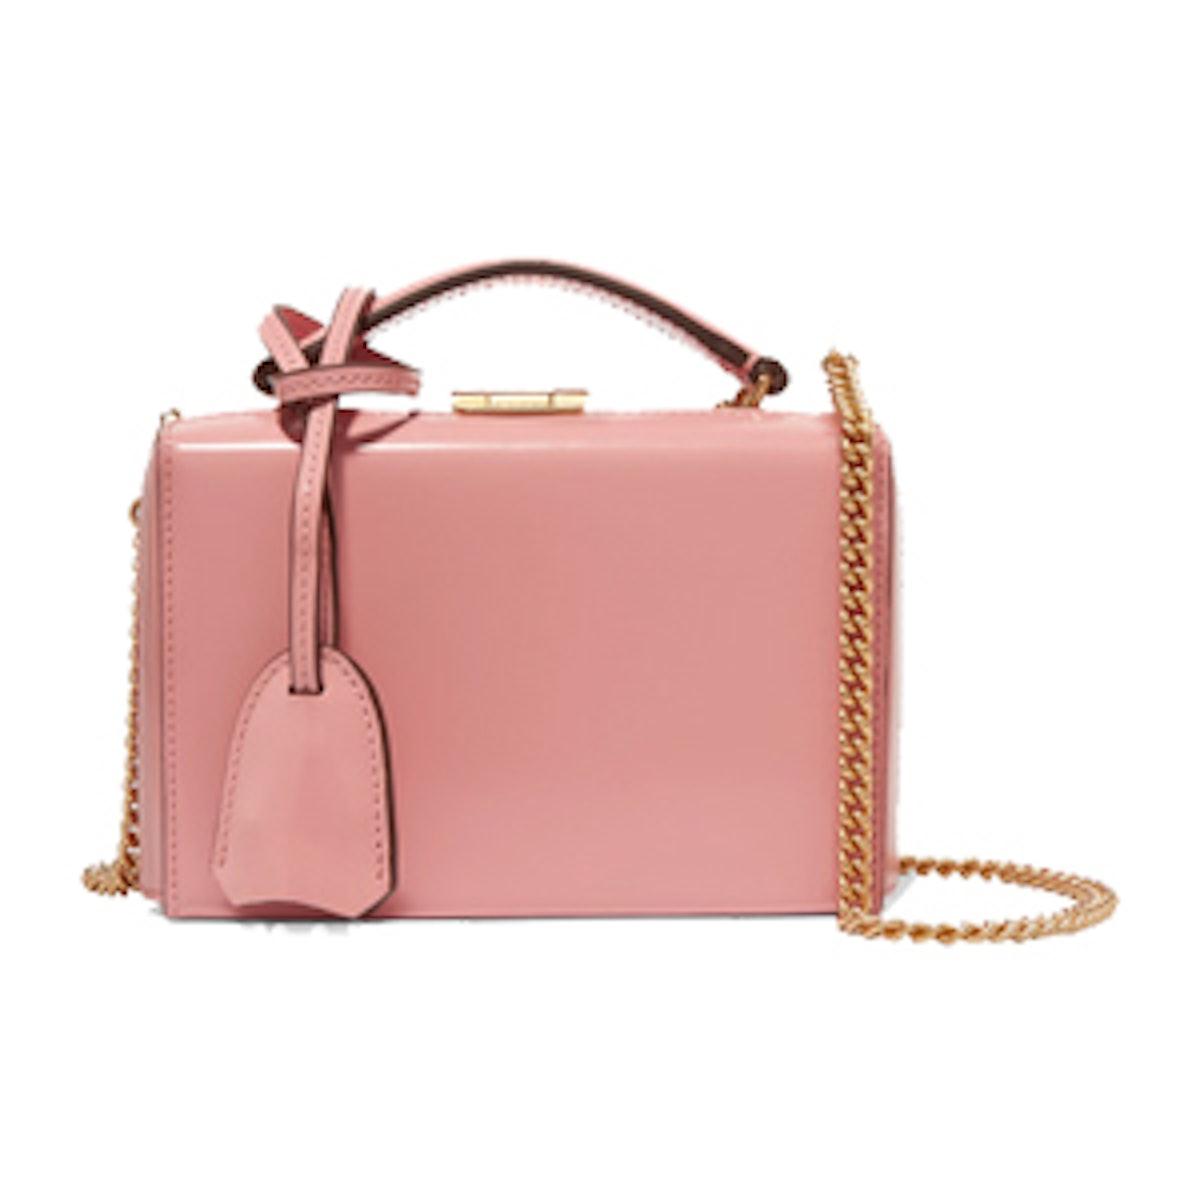 Grace Mini Glossed-Leather Shoulder Bag